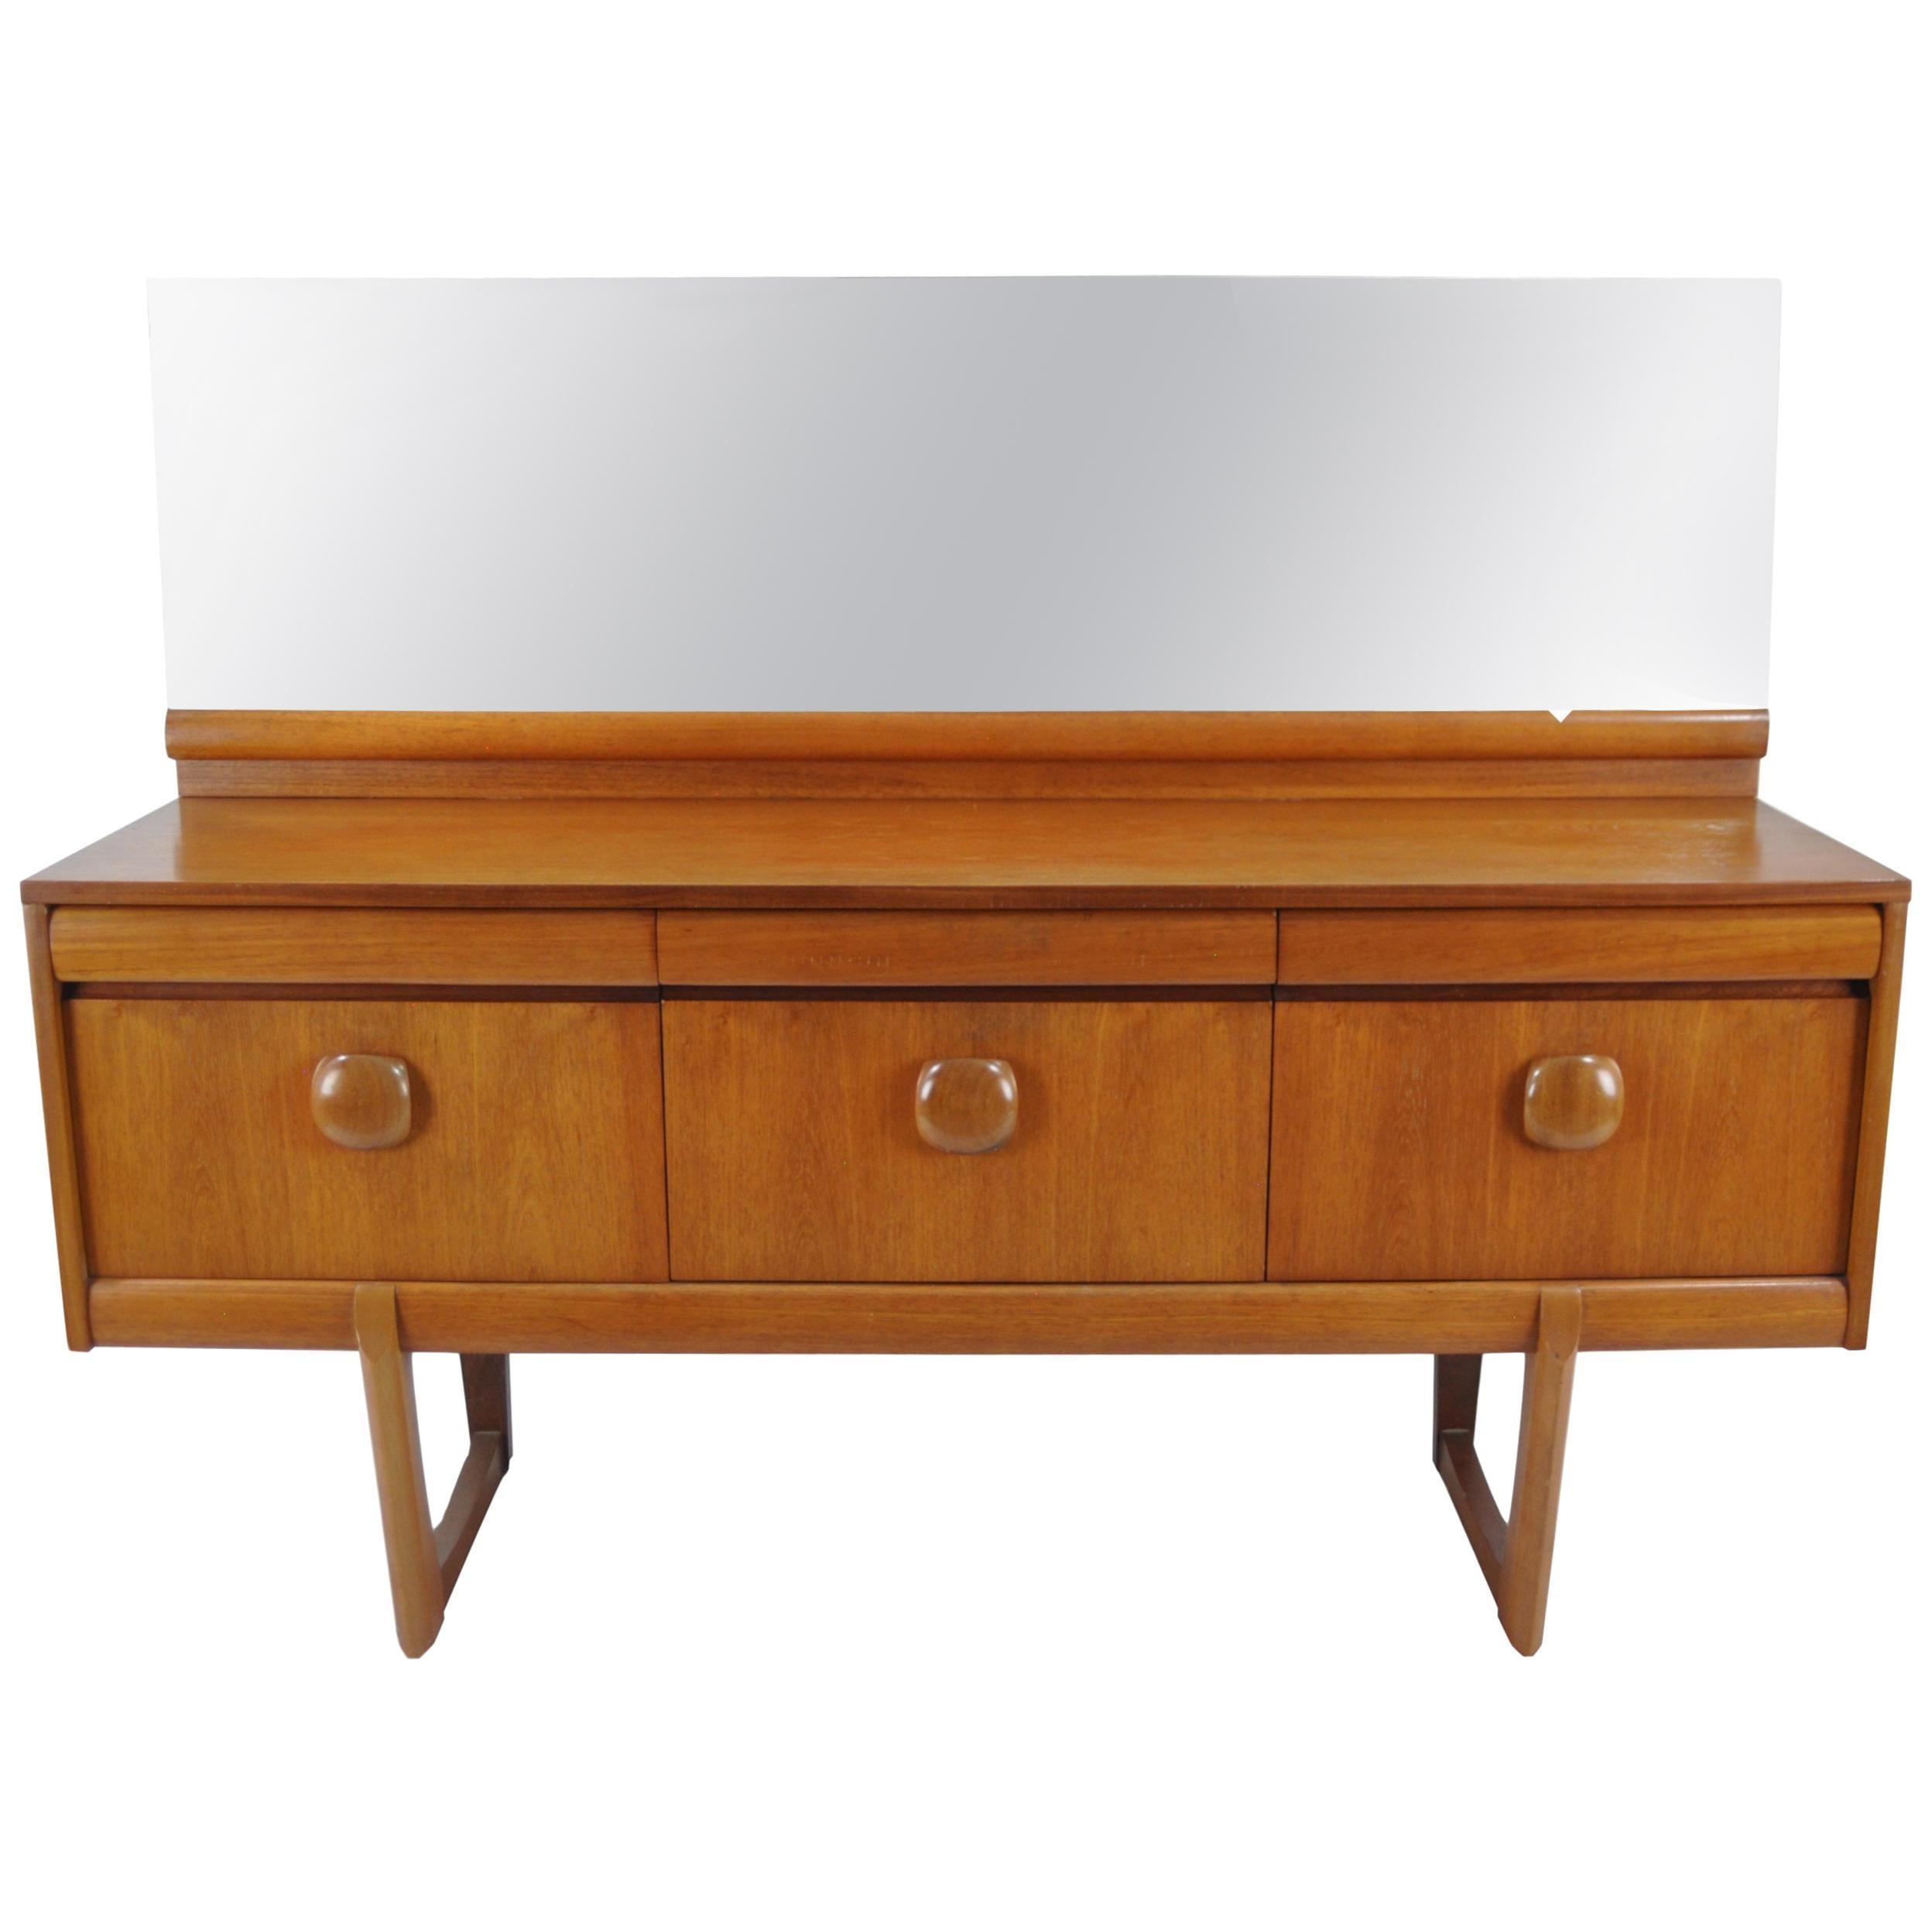 Mid century modern g plan vanity dressing table english circa 1960 for sale at 1stdibs